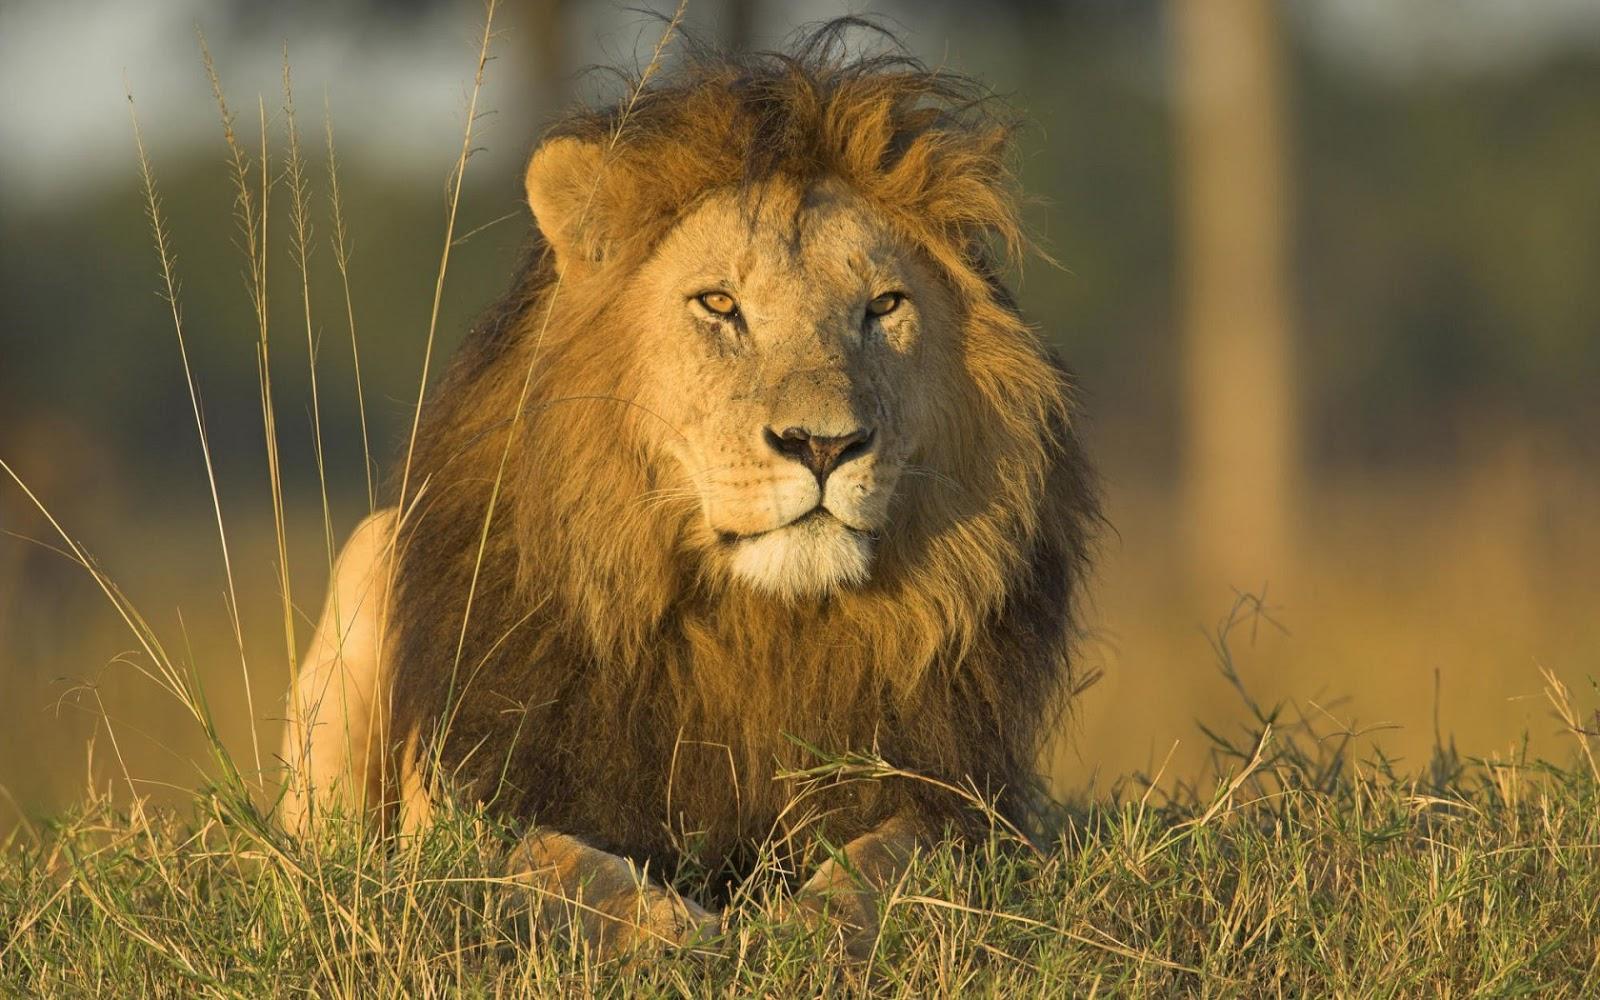 Lion pictures wallpaper - photo#50